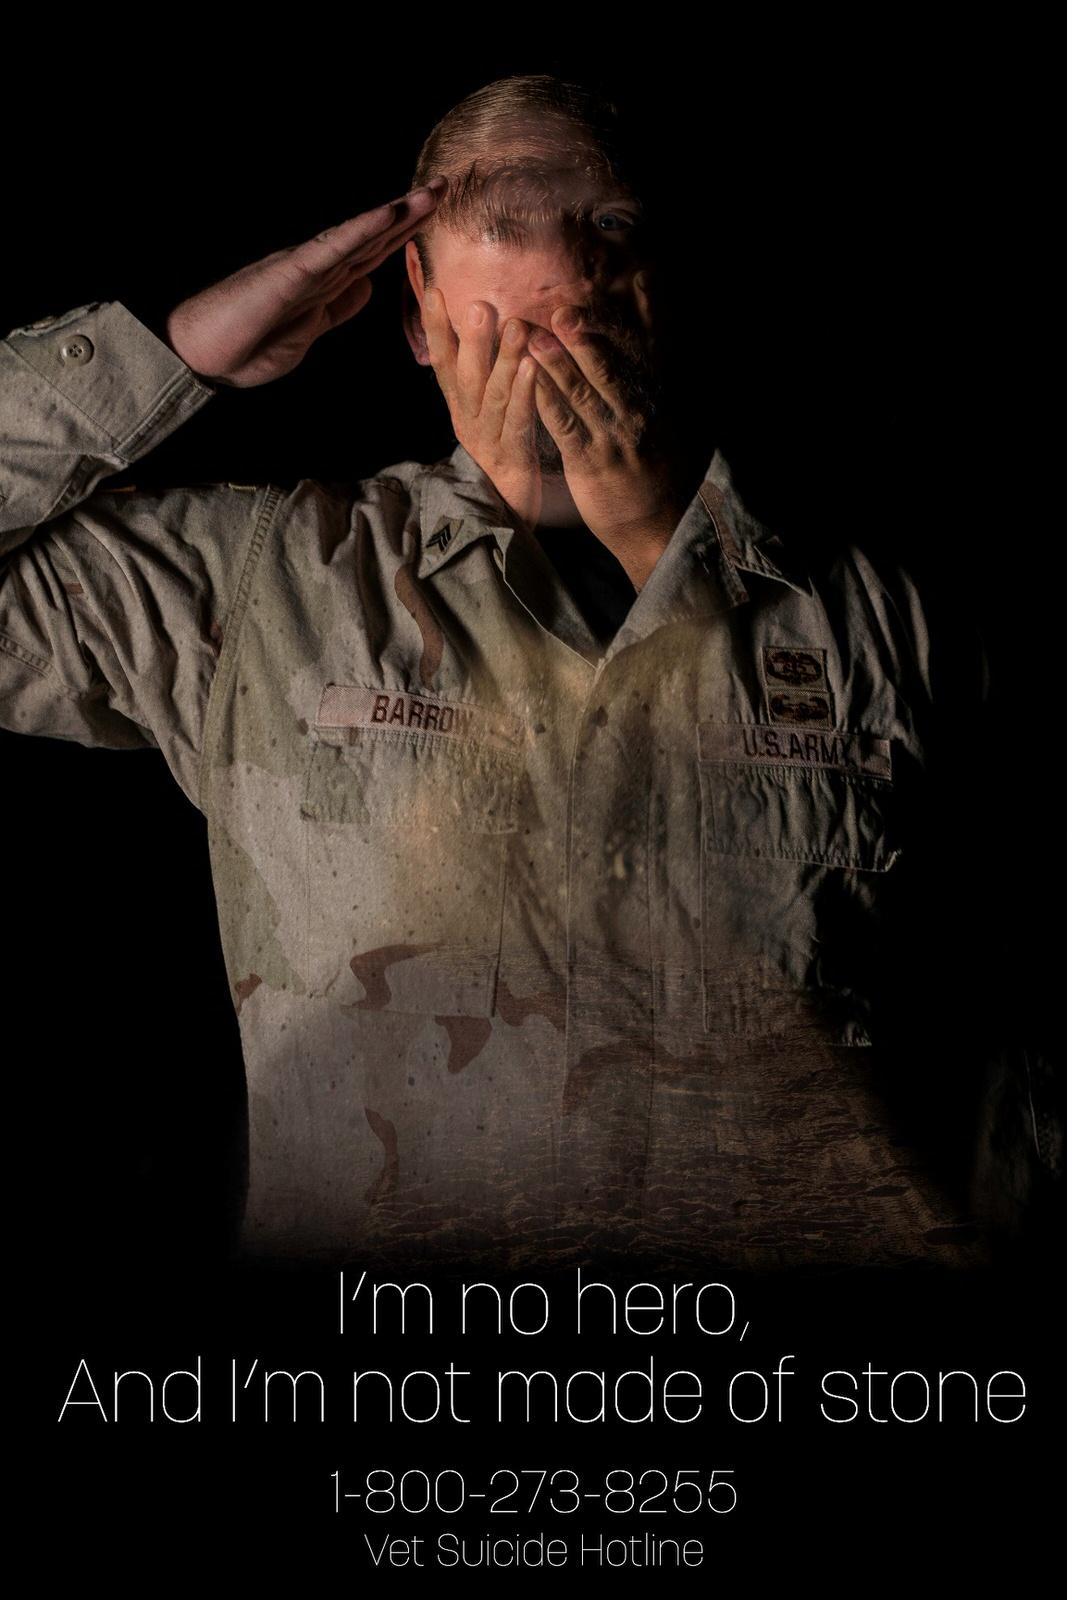 ;gotyour6, military mental health, I got your 6, ptsd, military ptsd, military tattoo, break the stigma